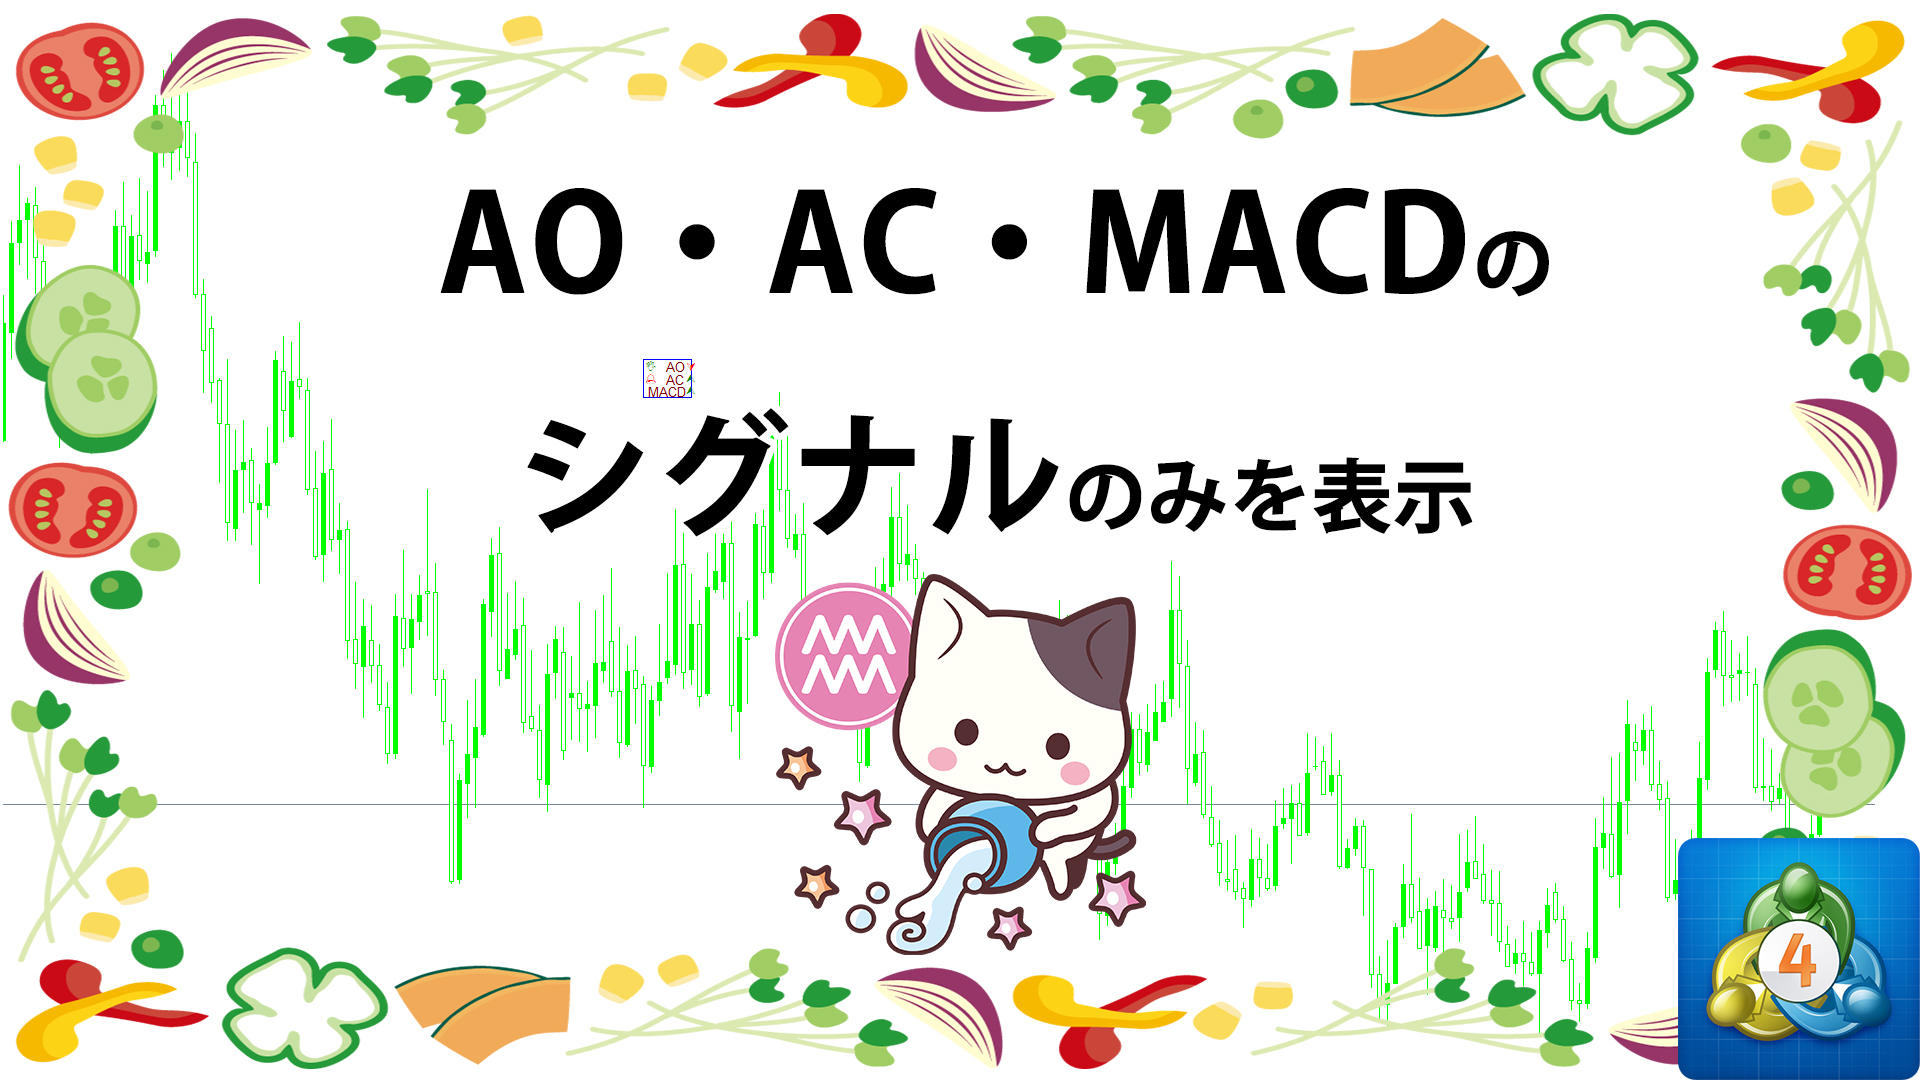 AO・AC・MACDのシグナルを矢印で表示するMT4インジケーター「Williams_Inds」